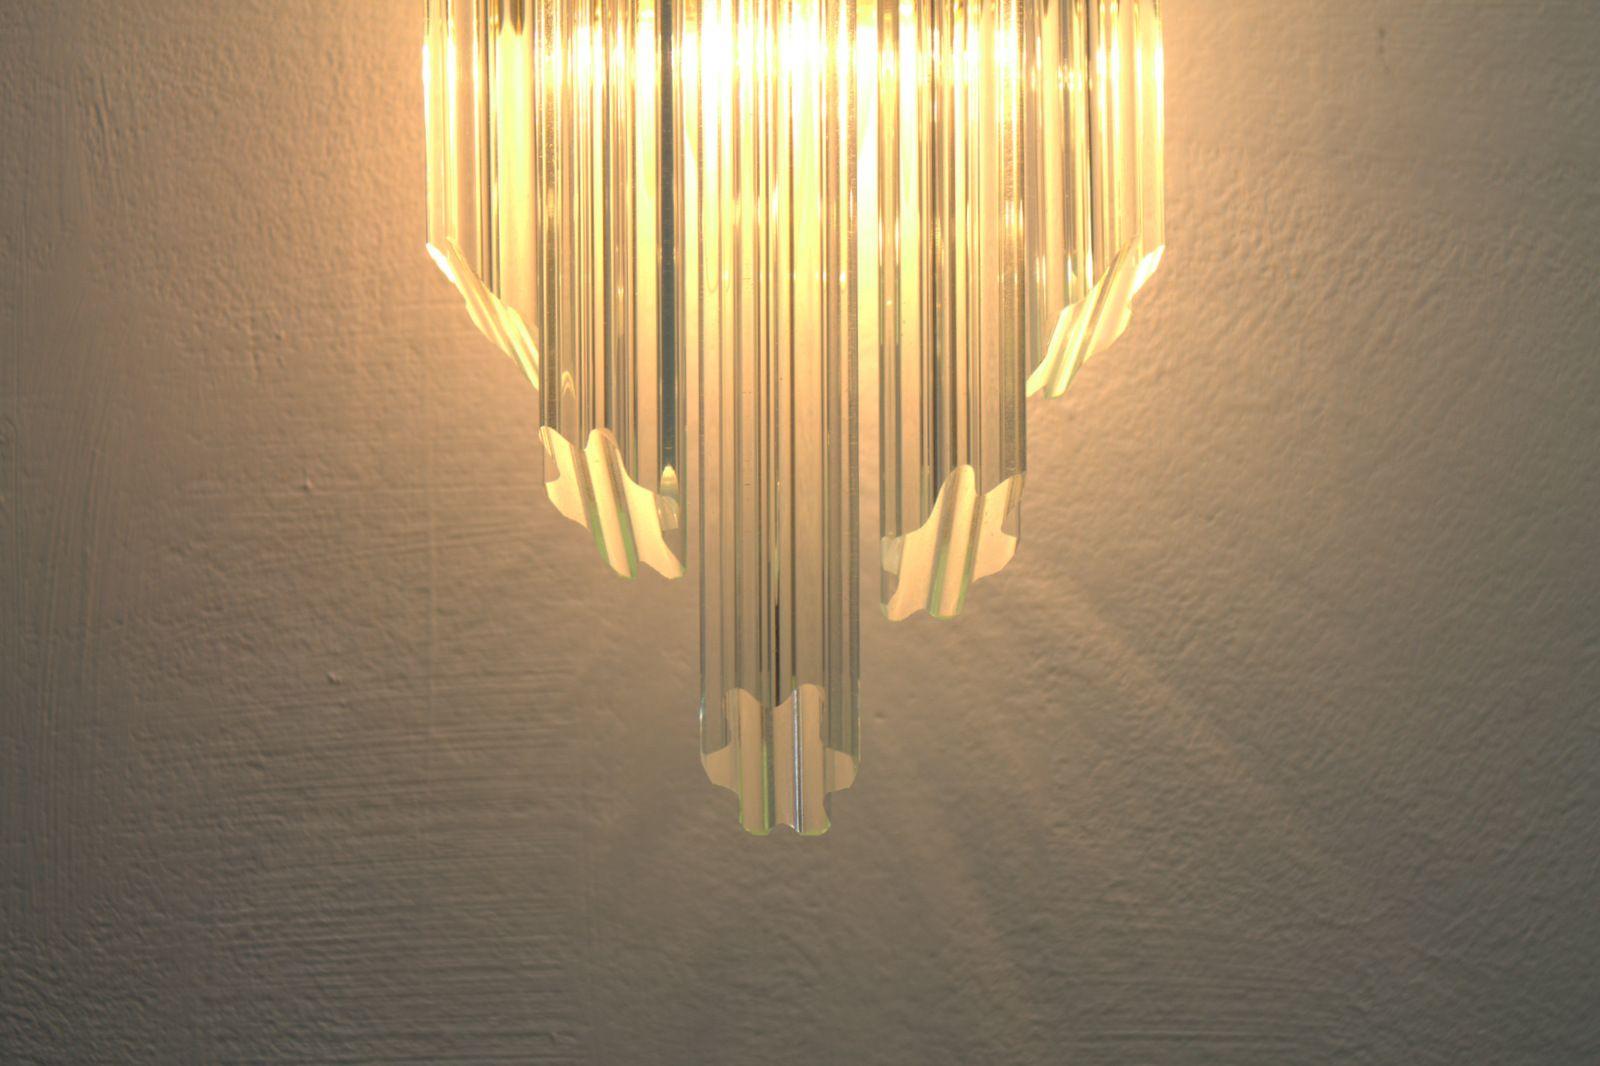 Murano Glass Wall Lamps : Italian Murano Glass & Gilded Metal Wall Lamps, 1970s, Set of 2 for sale at Pamono